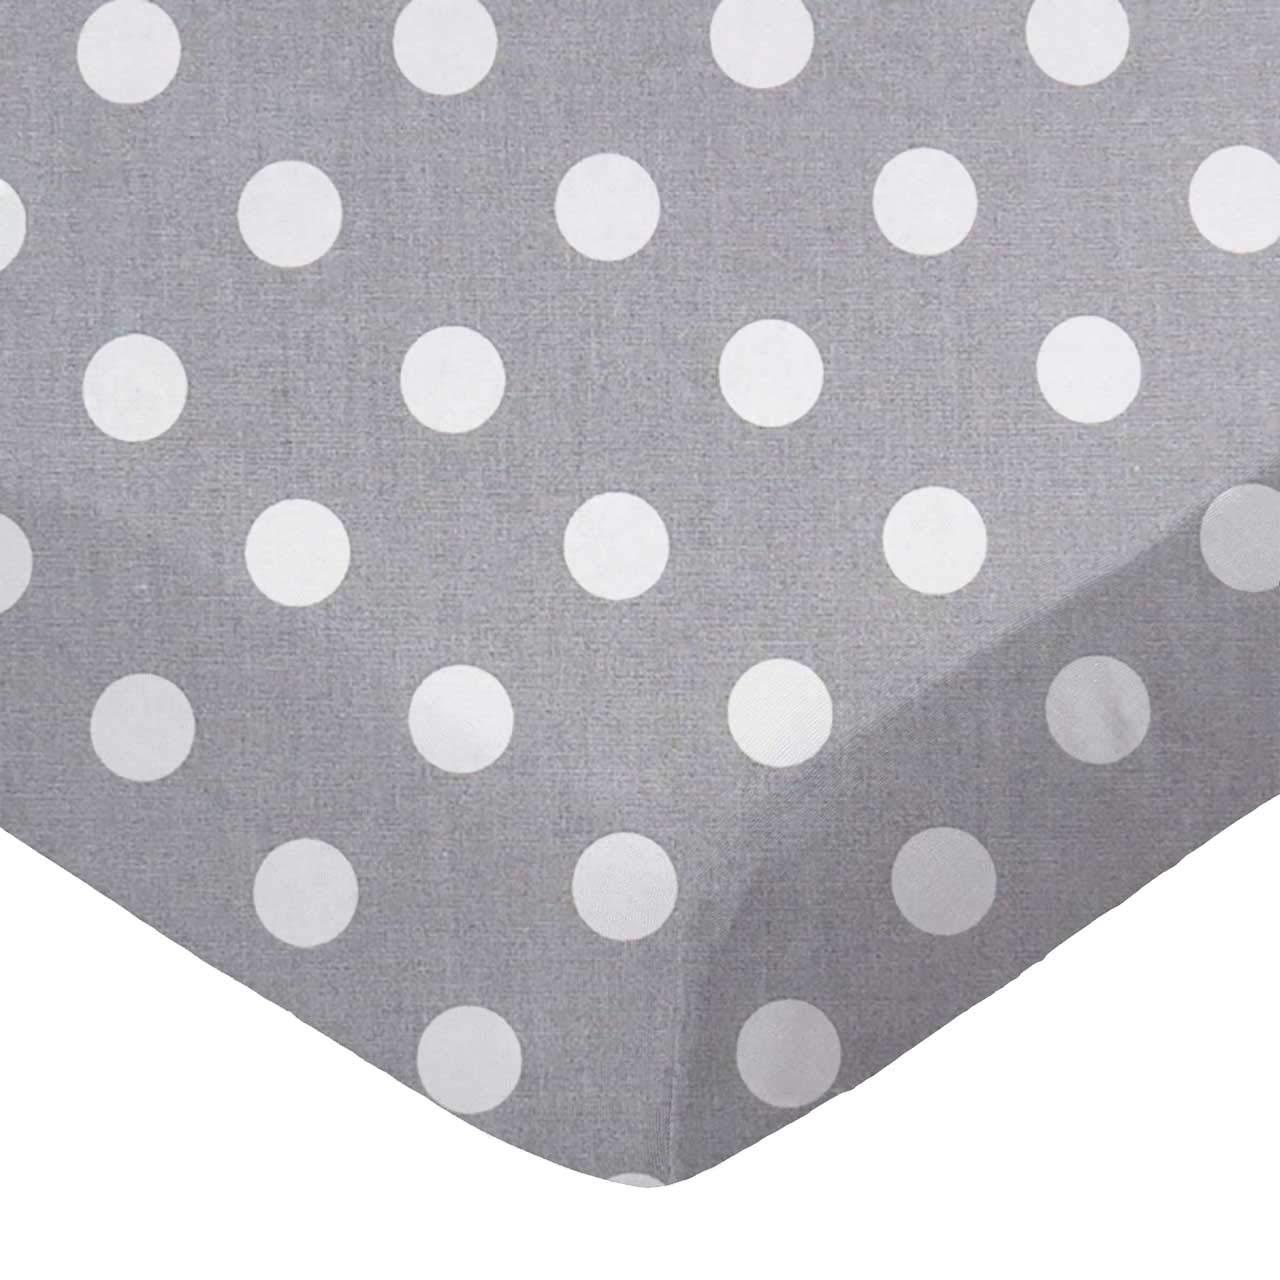 SheetWorld Fitted Basket Sheet - Polka Dots Grey - Made In USA